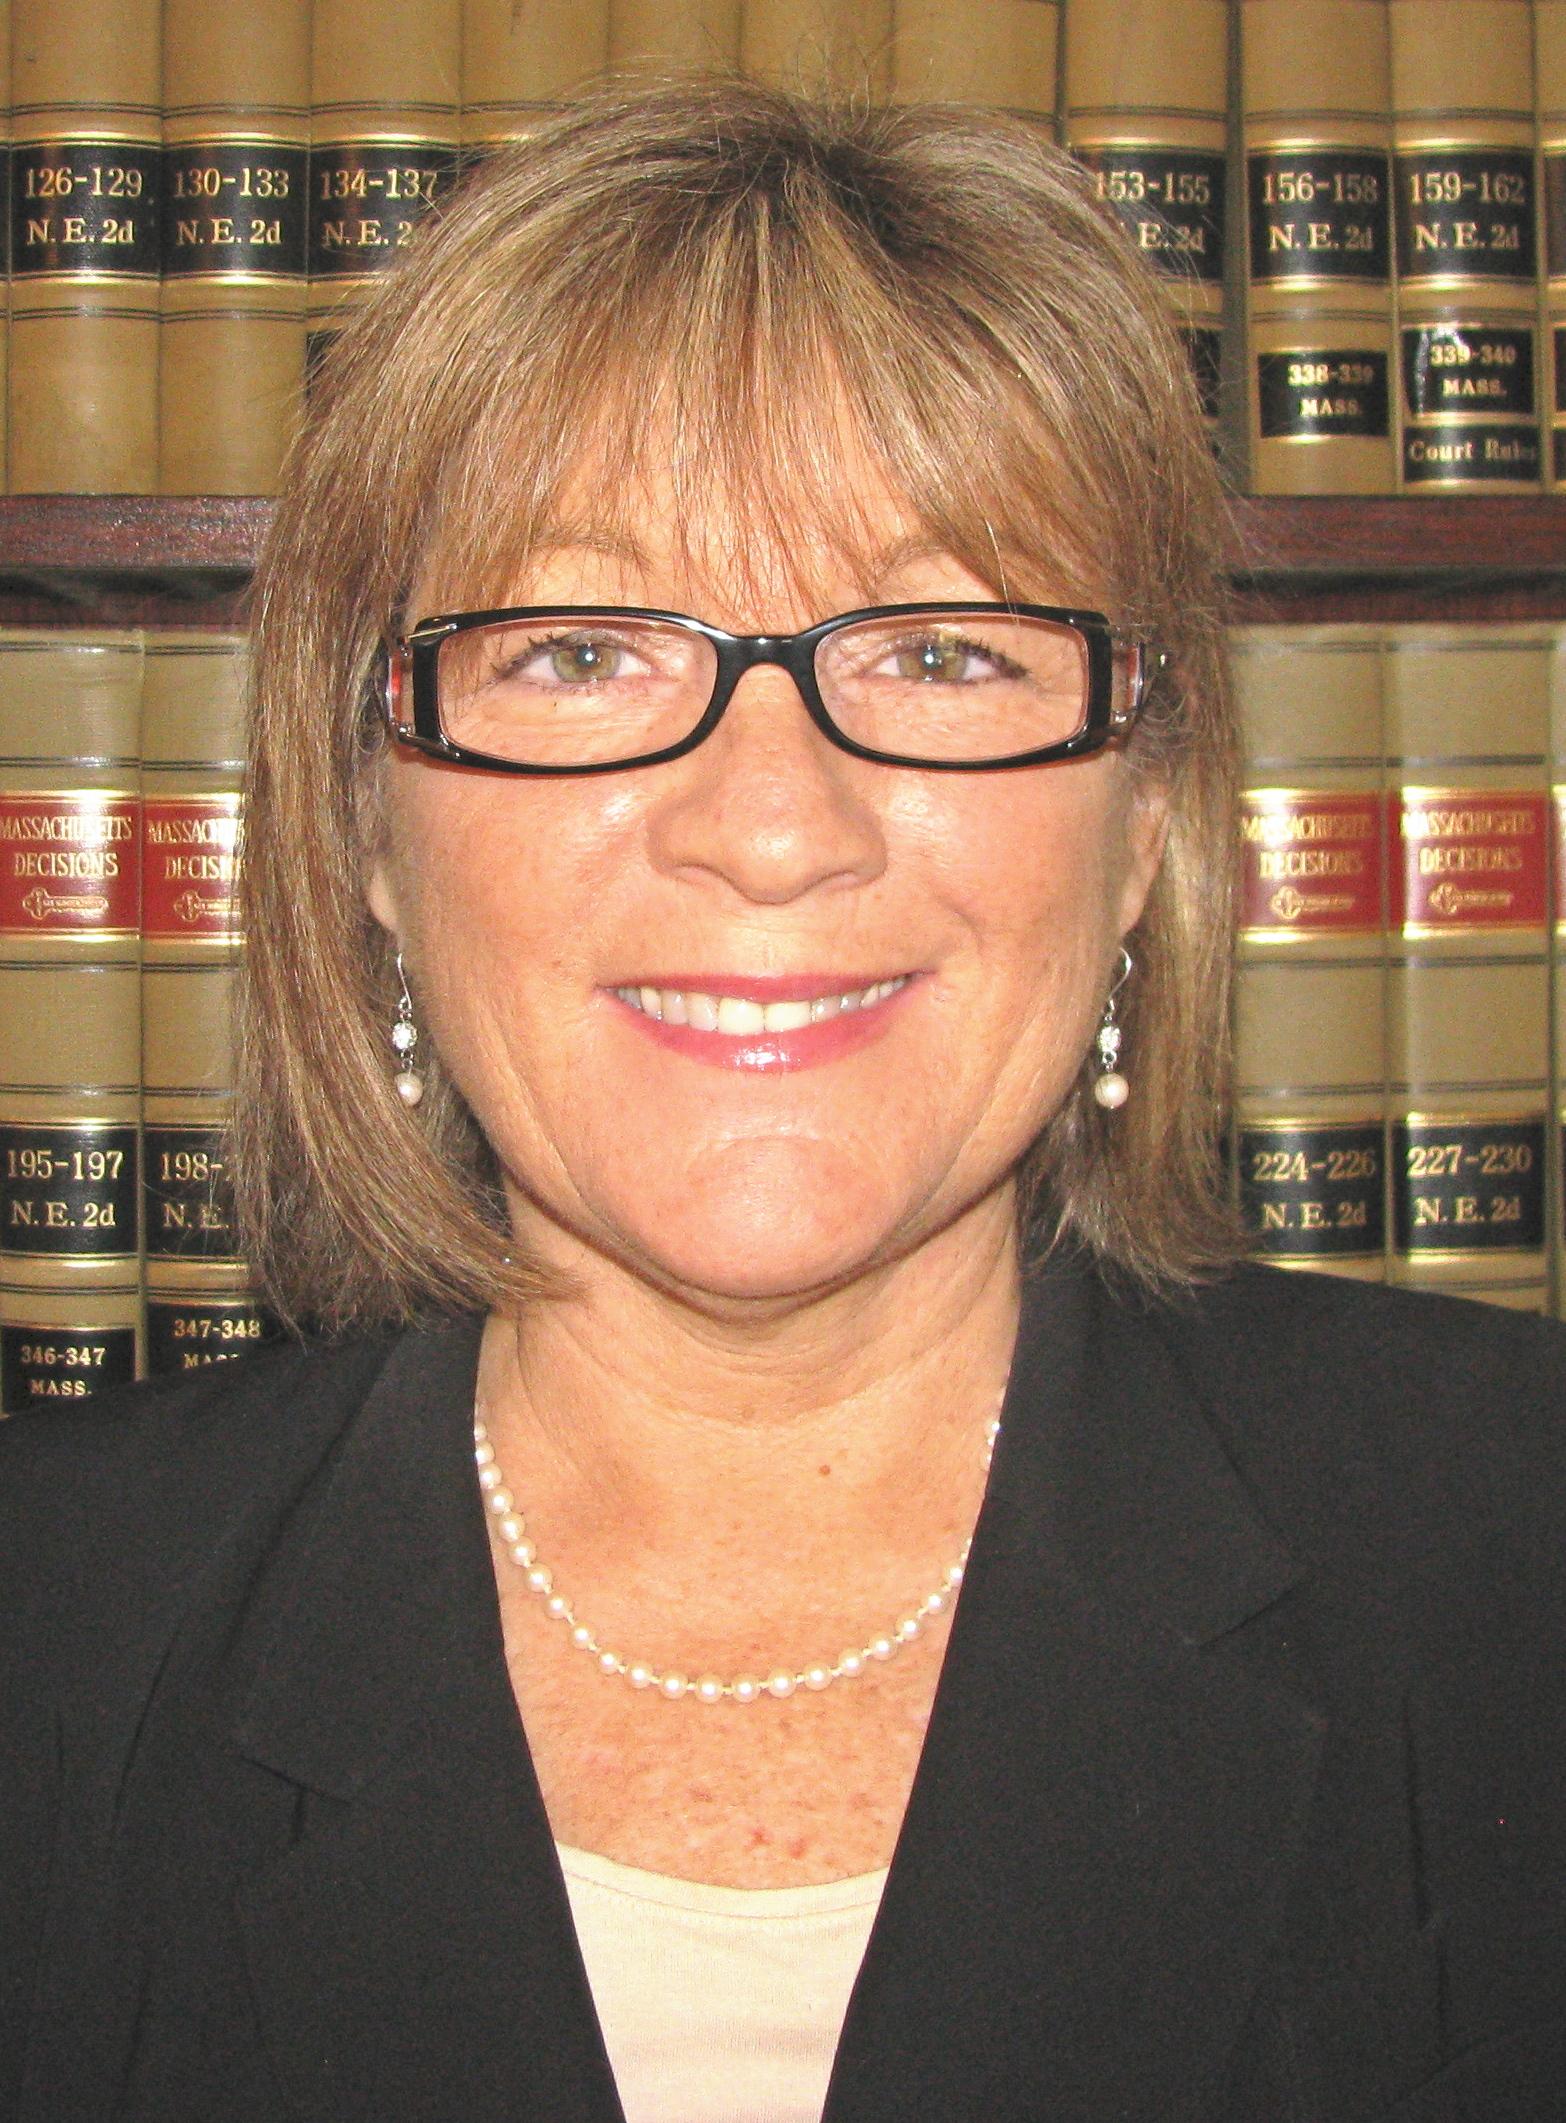 NICASTRO LAW, L.L.C. image 5